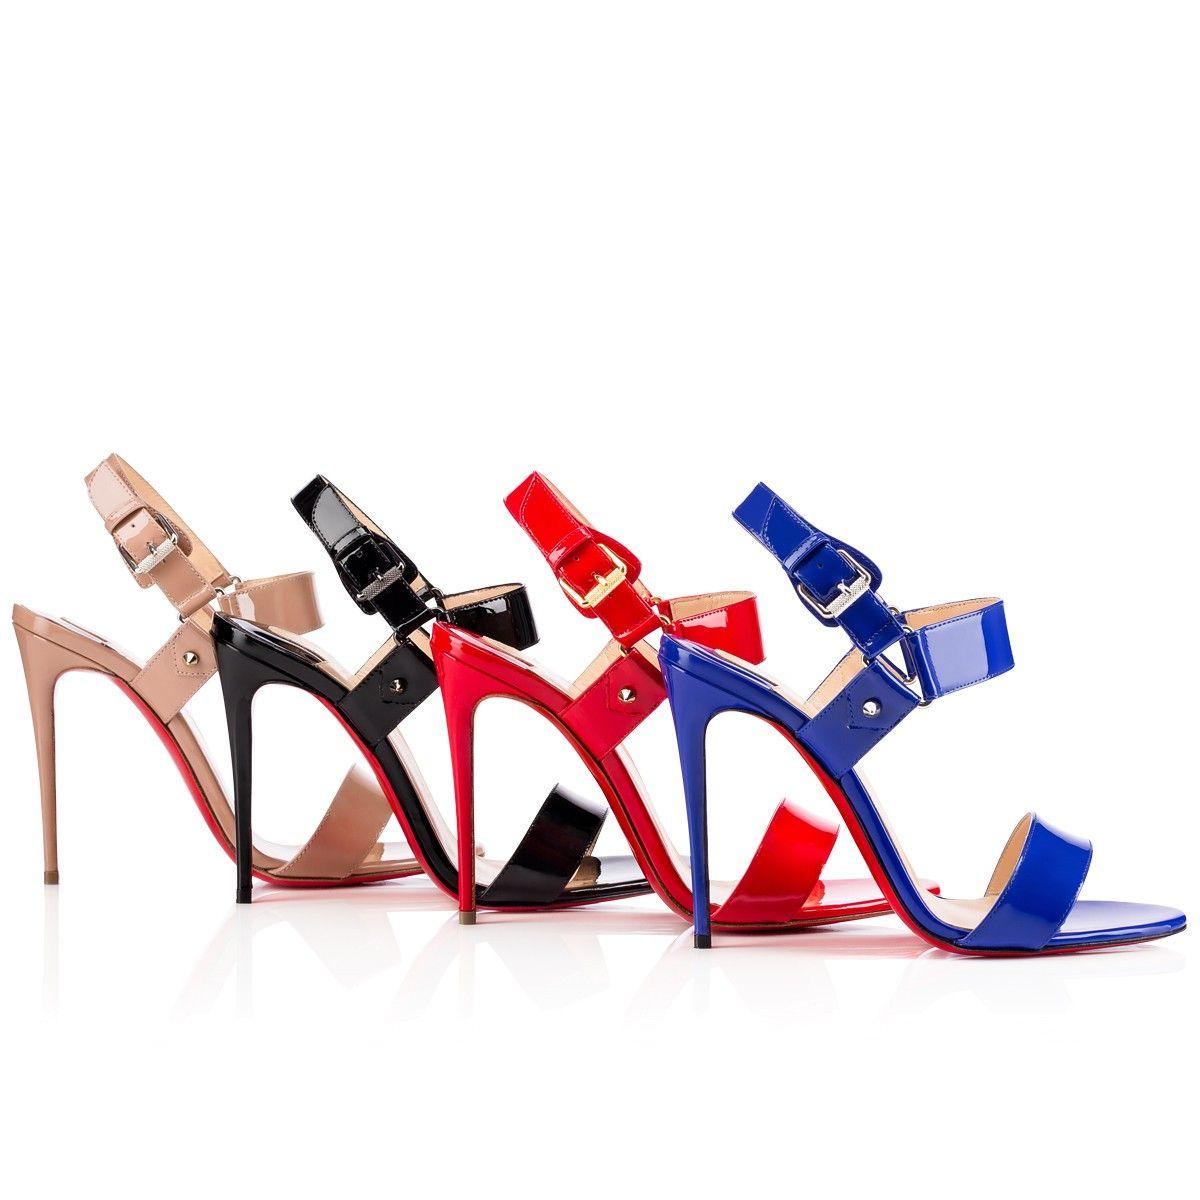 Black sandals louboutin - Sova Heel 100 Black Patent Leather Women Shoes Christian Louboutin